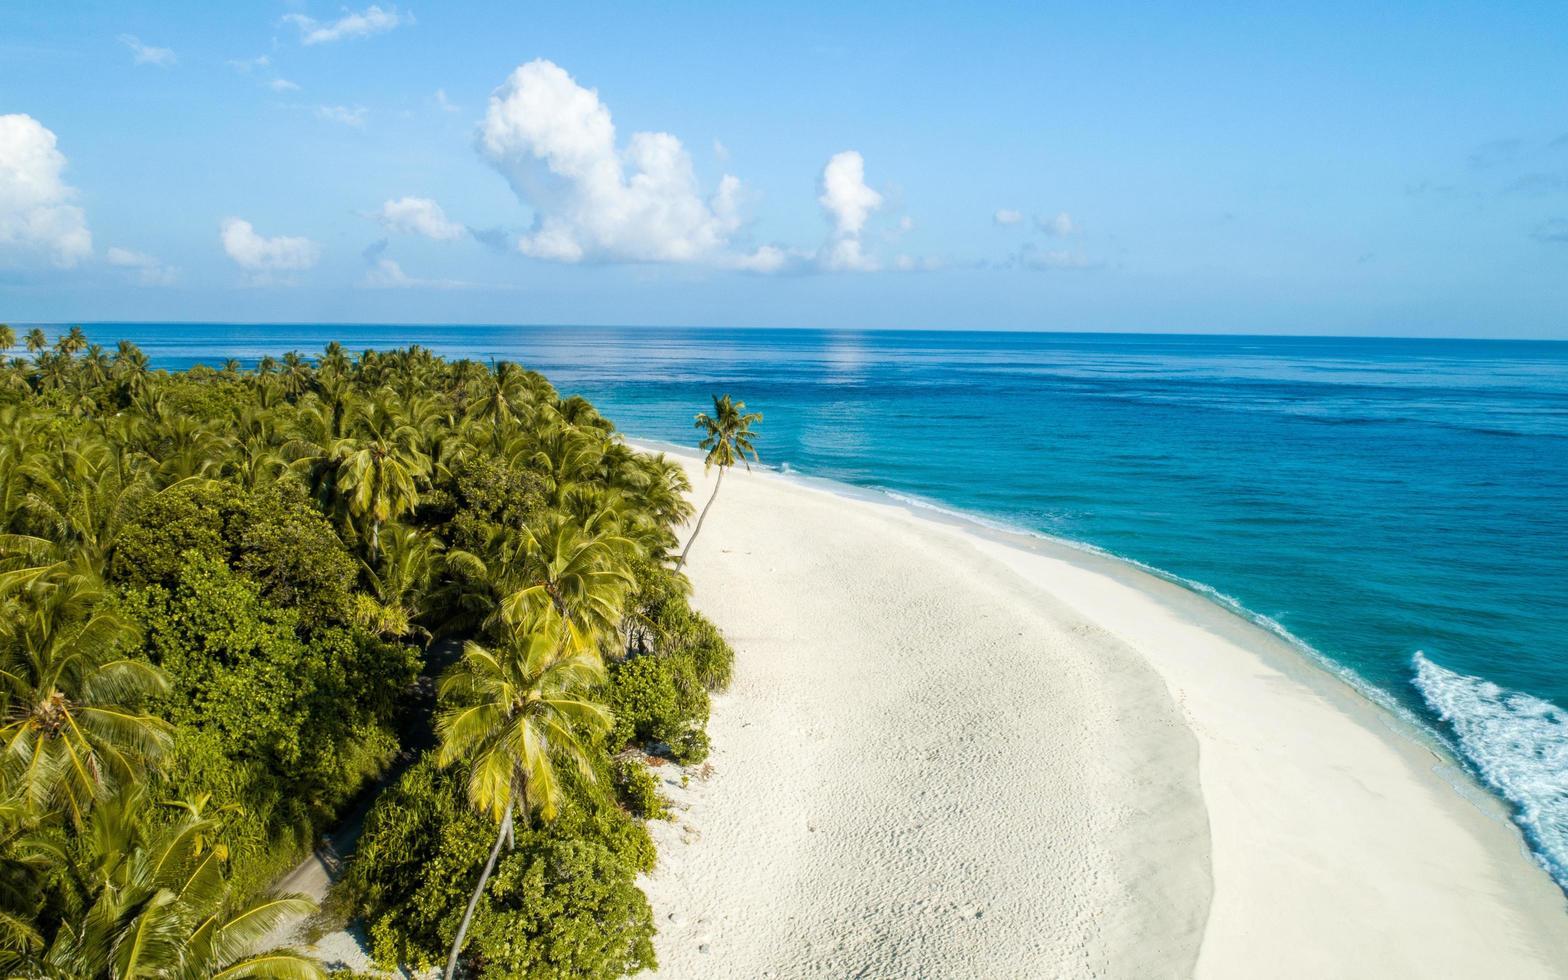 Green palm trees at the seashore photo